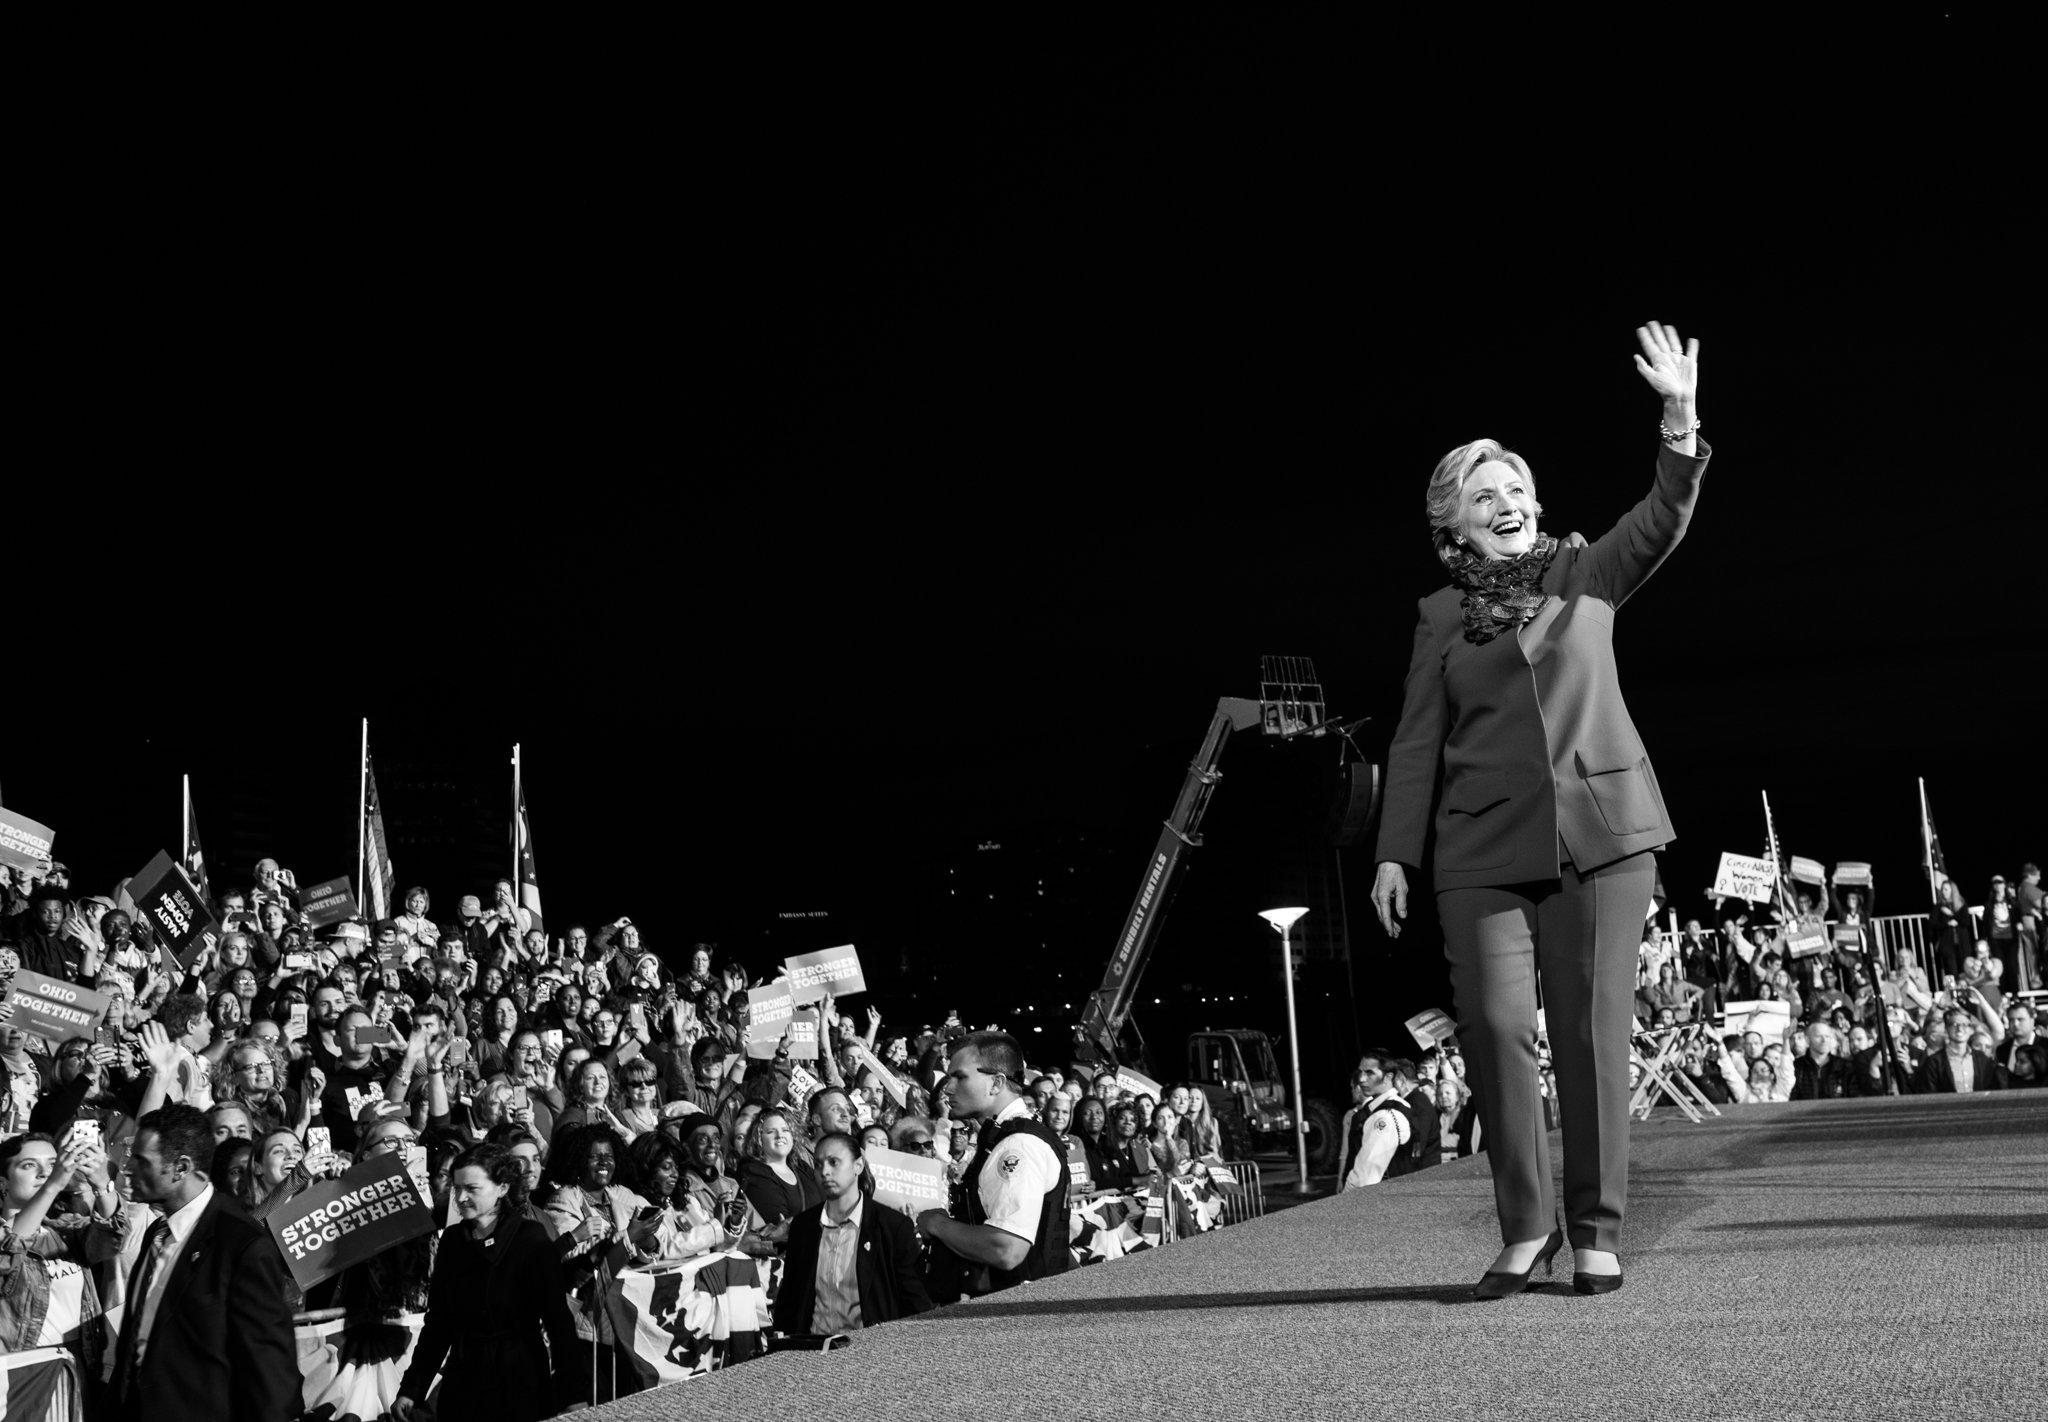 If you believe in a better, stronger, fairer America:  Vote. https://t.co/3TKJ4H68Kz https://t.co/txByLknaxT